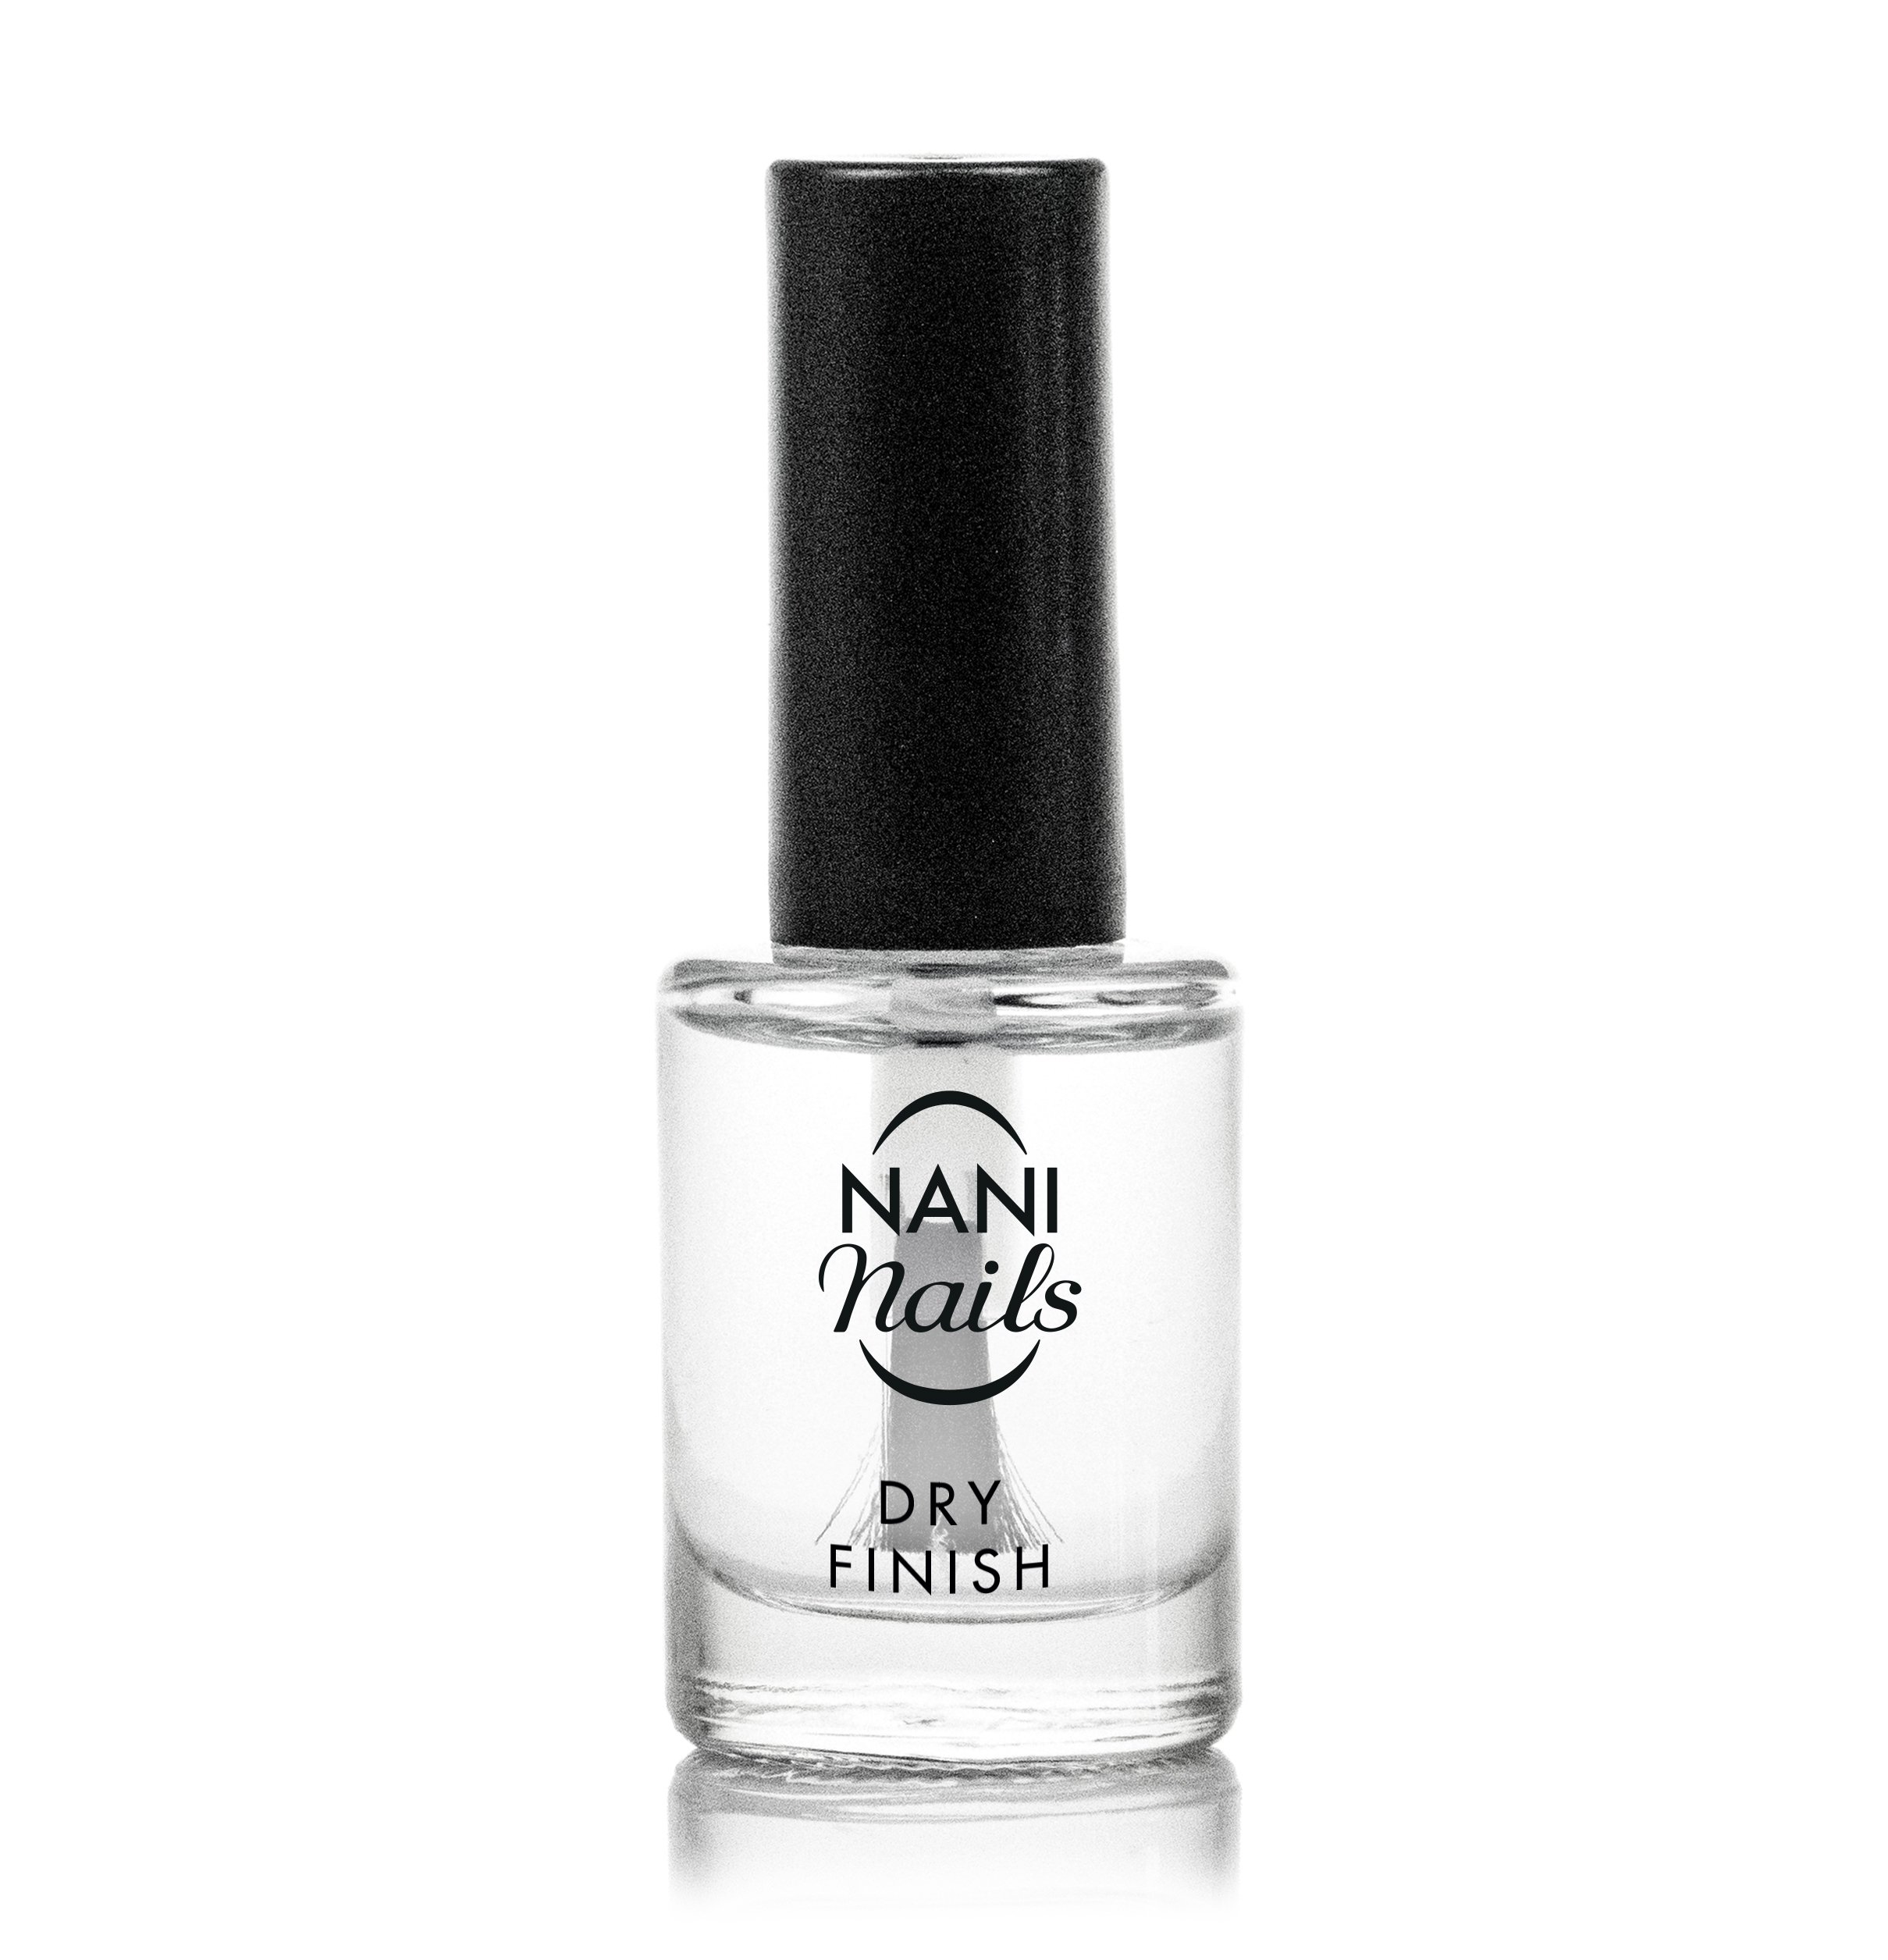 Nani Vysousec Laku Dry Finish 11 Ml Naninails Cz